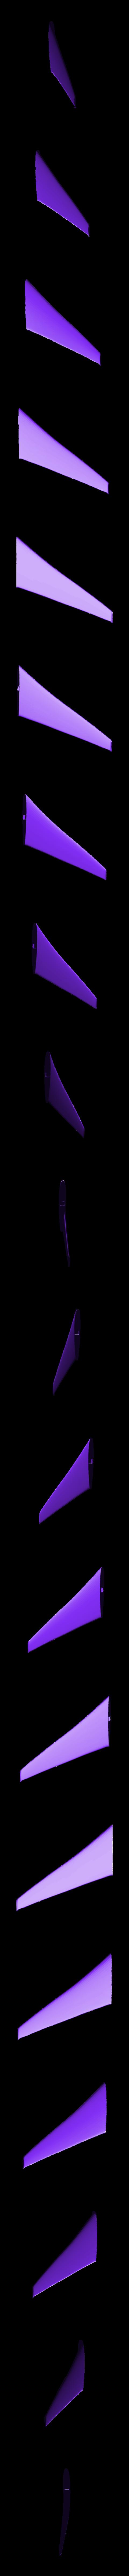 Wing_R.stl Download STL file Replica Gulfstream G650 3D print model • 3D print design, Eduardohbm